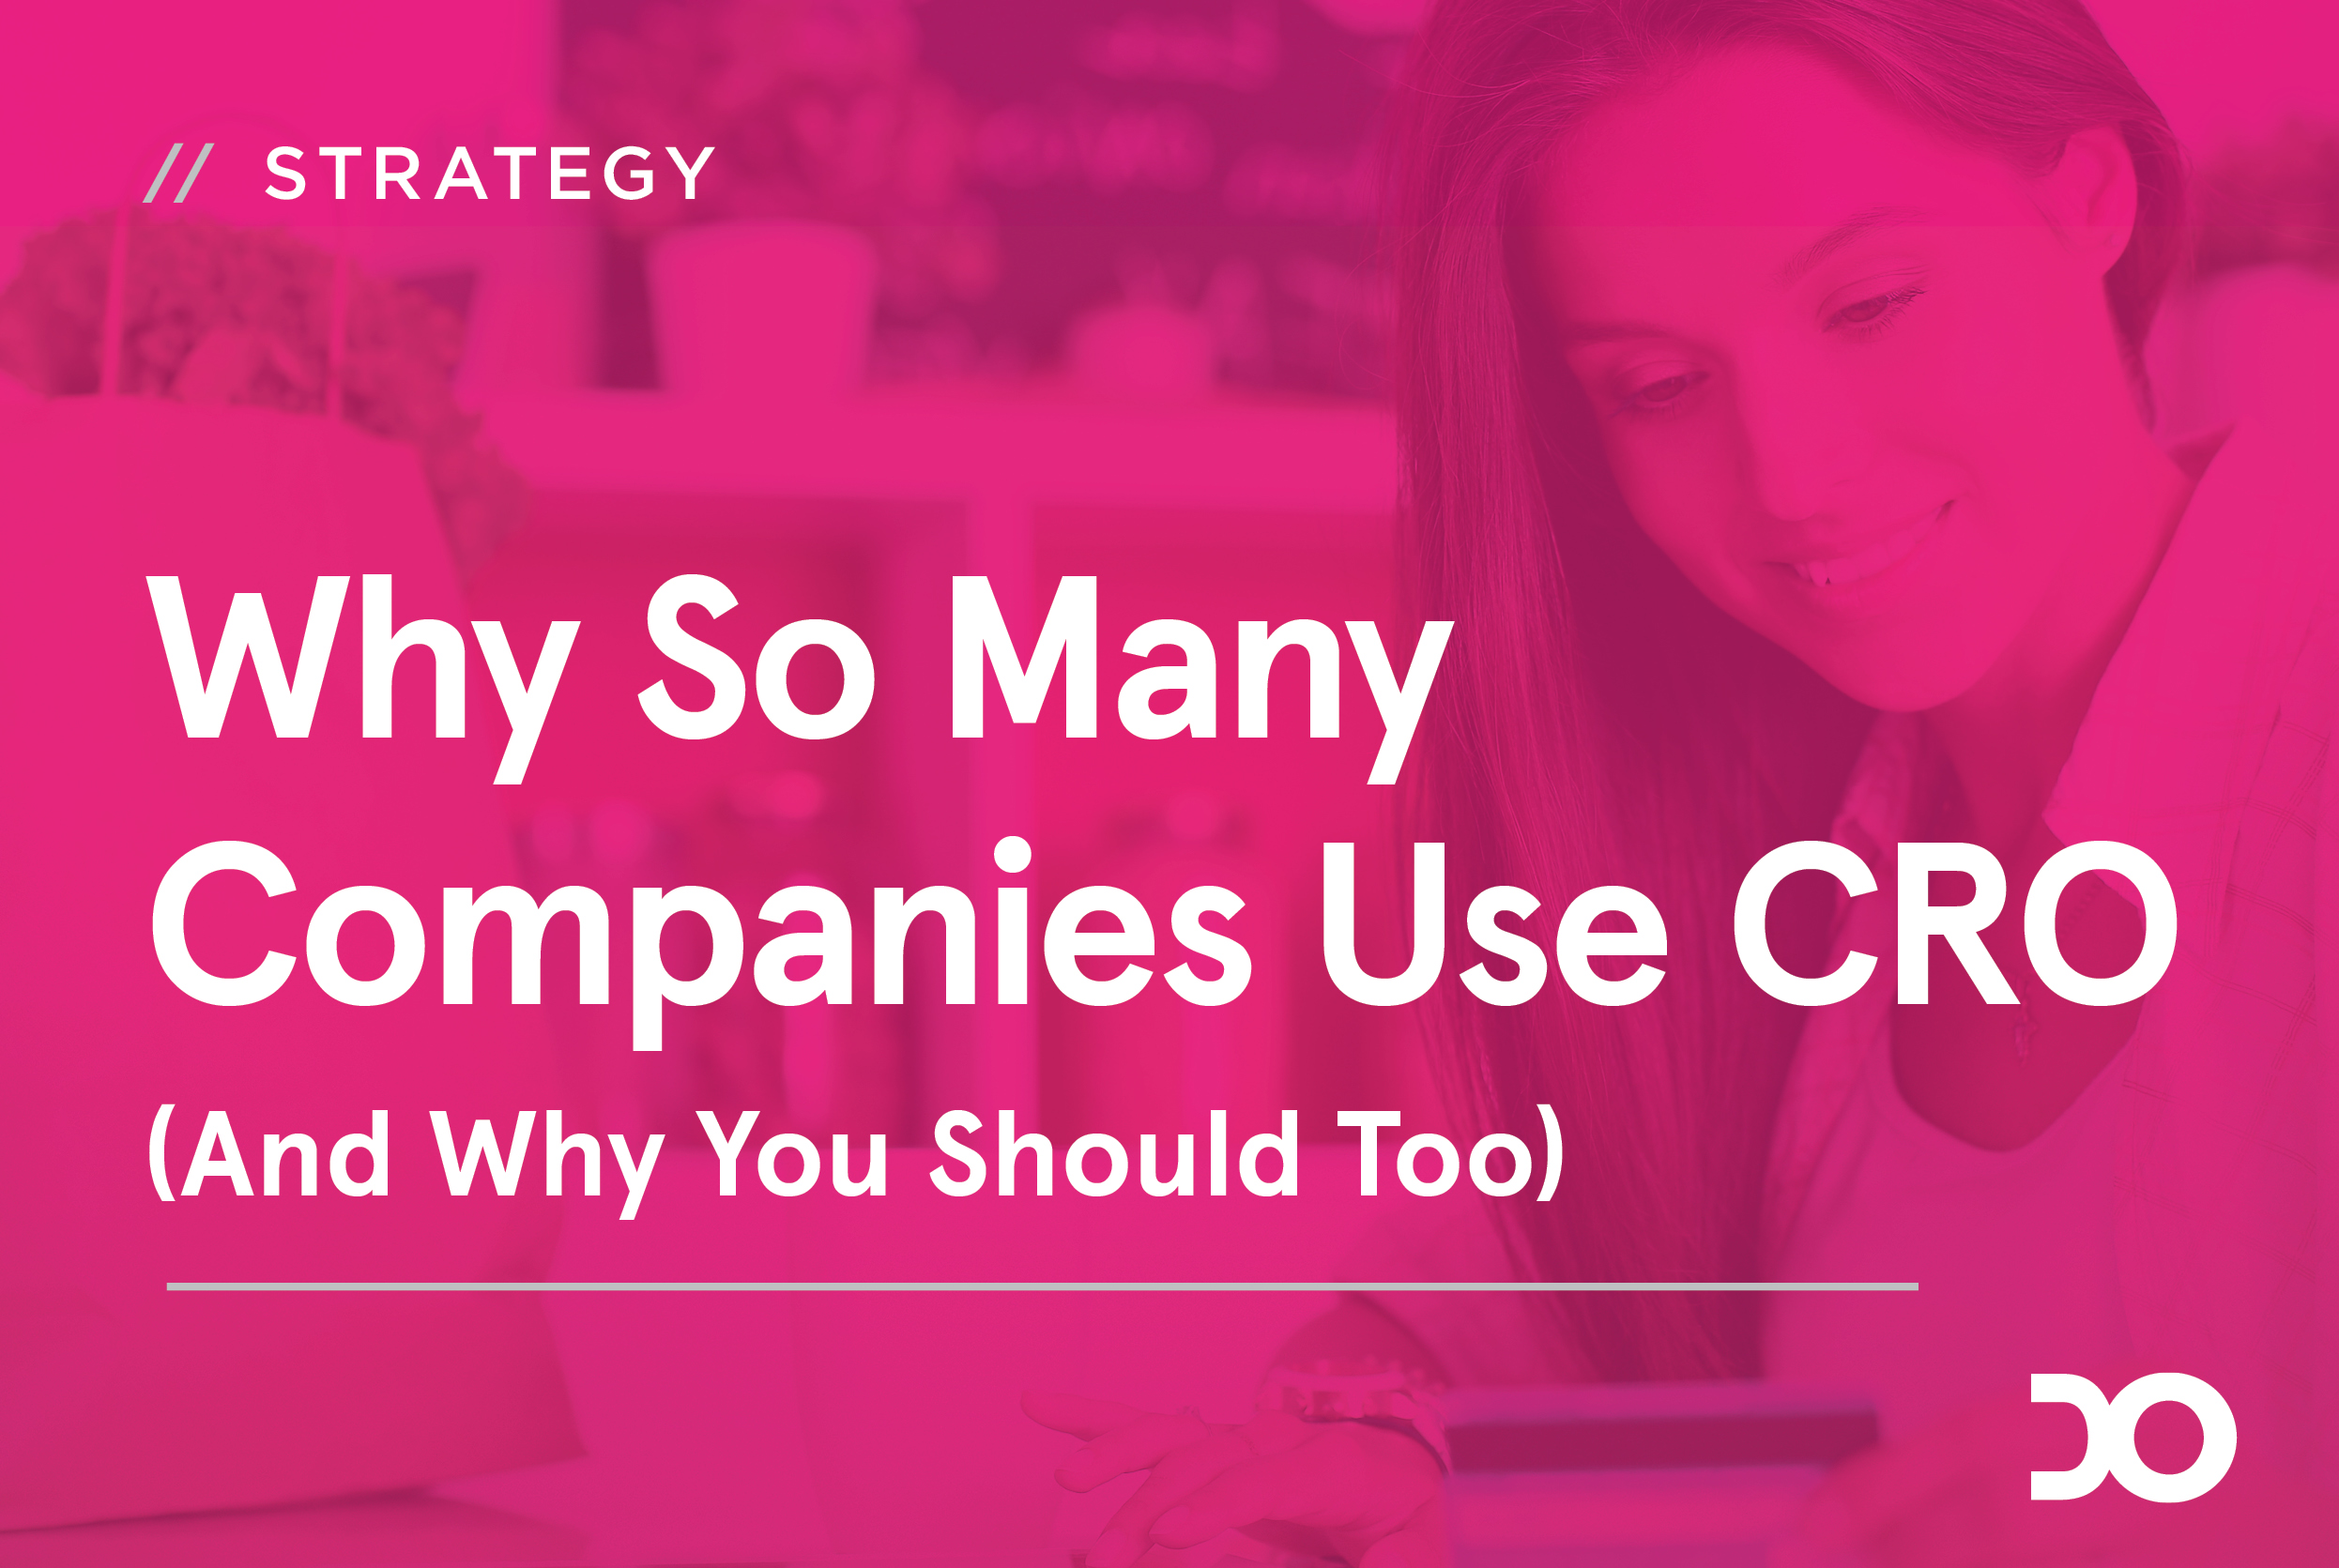 Using CRO